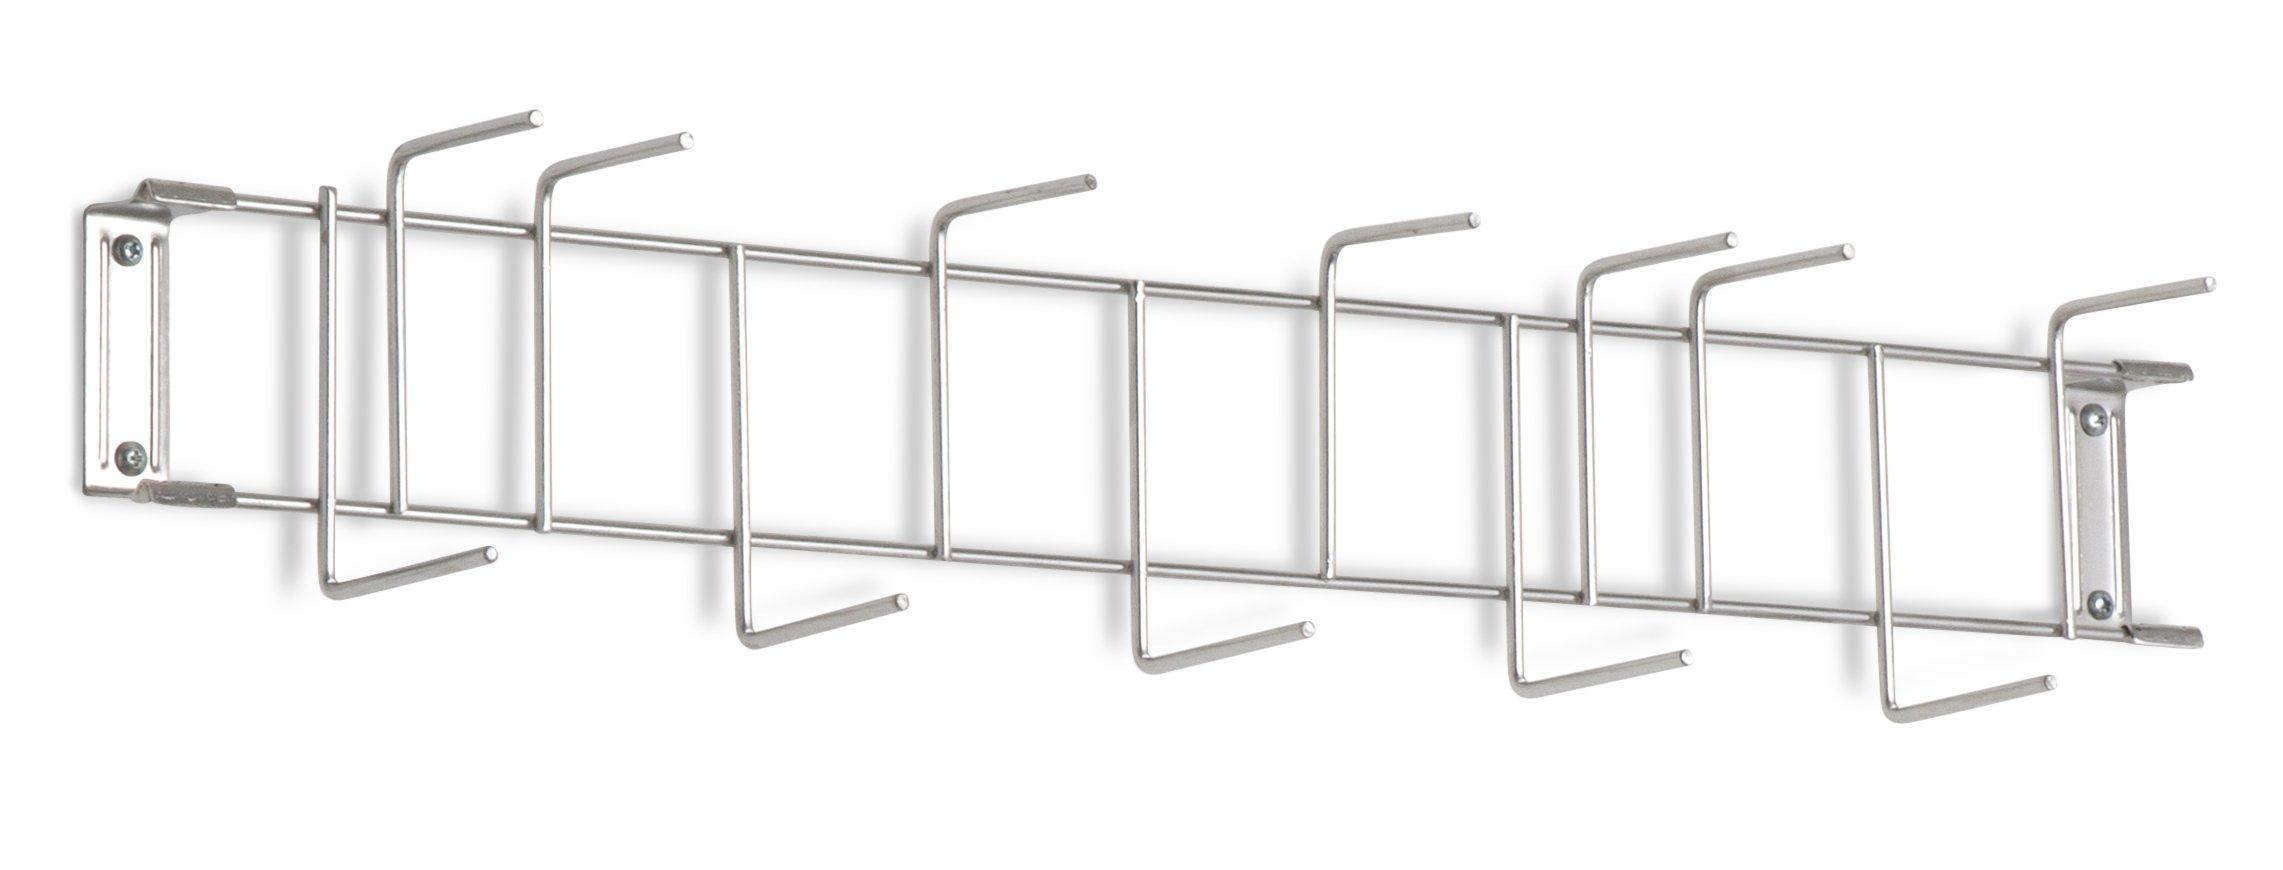 Horizon 4081 26'' Steel Utility Sanitation Brush Rack with 12 Hooks, 26-1/4'' Width x 6-1/2'' Height x 4'' Depth, Stainless Steel